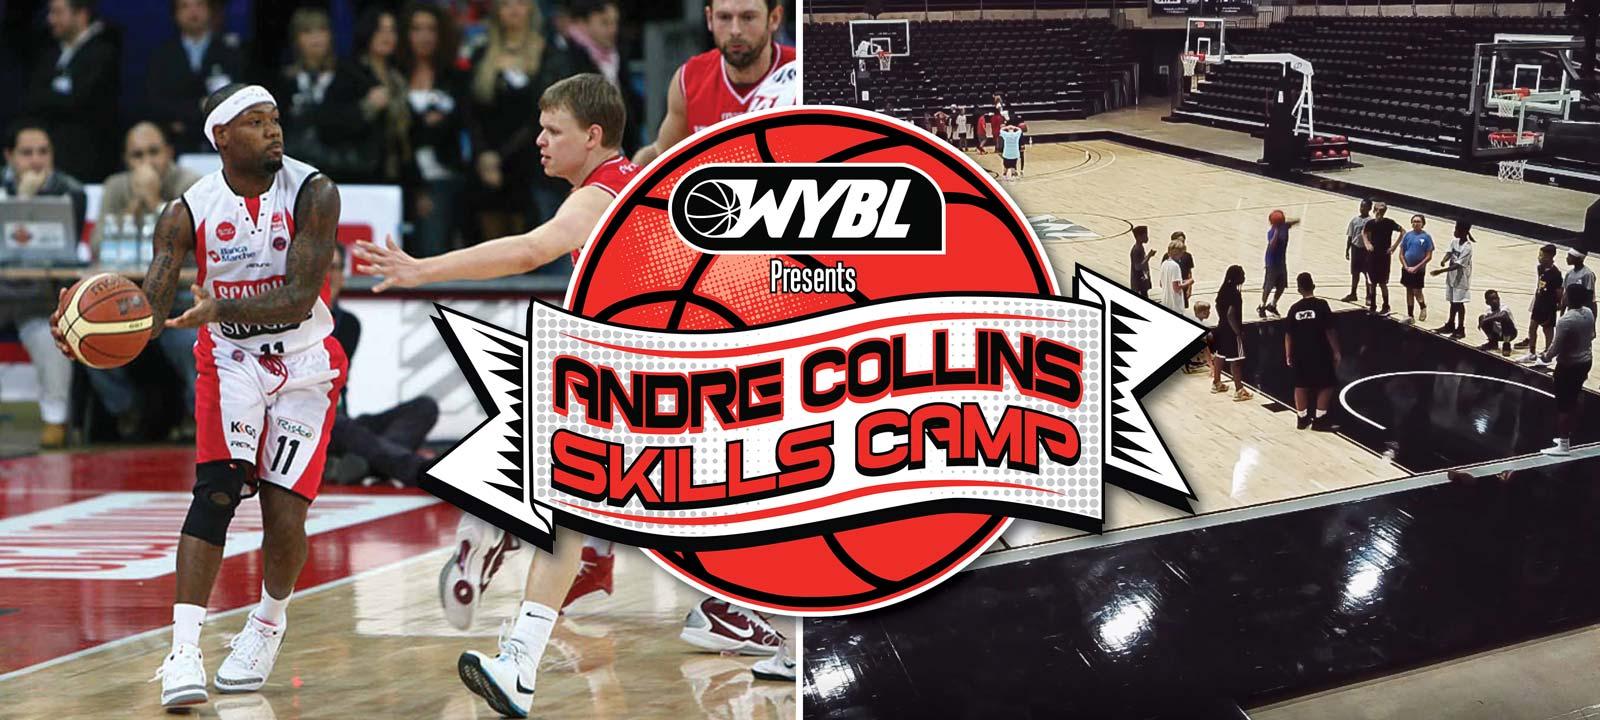 Basketball - WYBL Presents Andre Collins Skills Camp